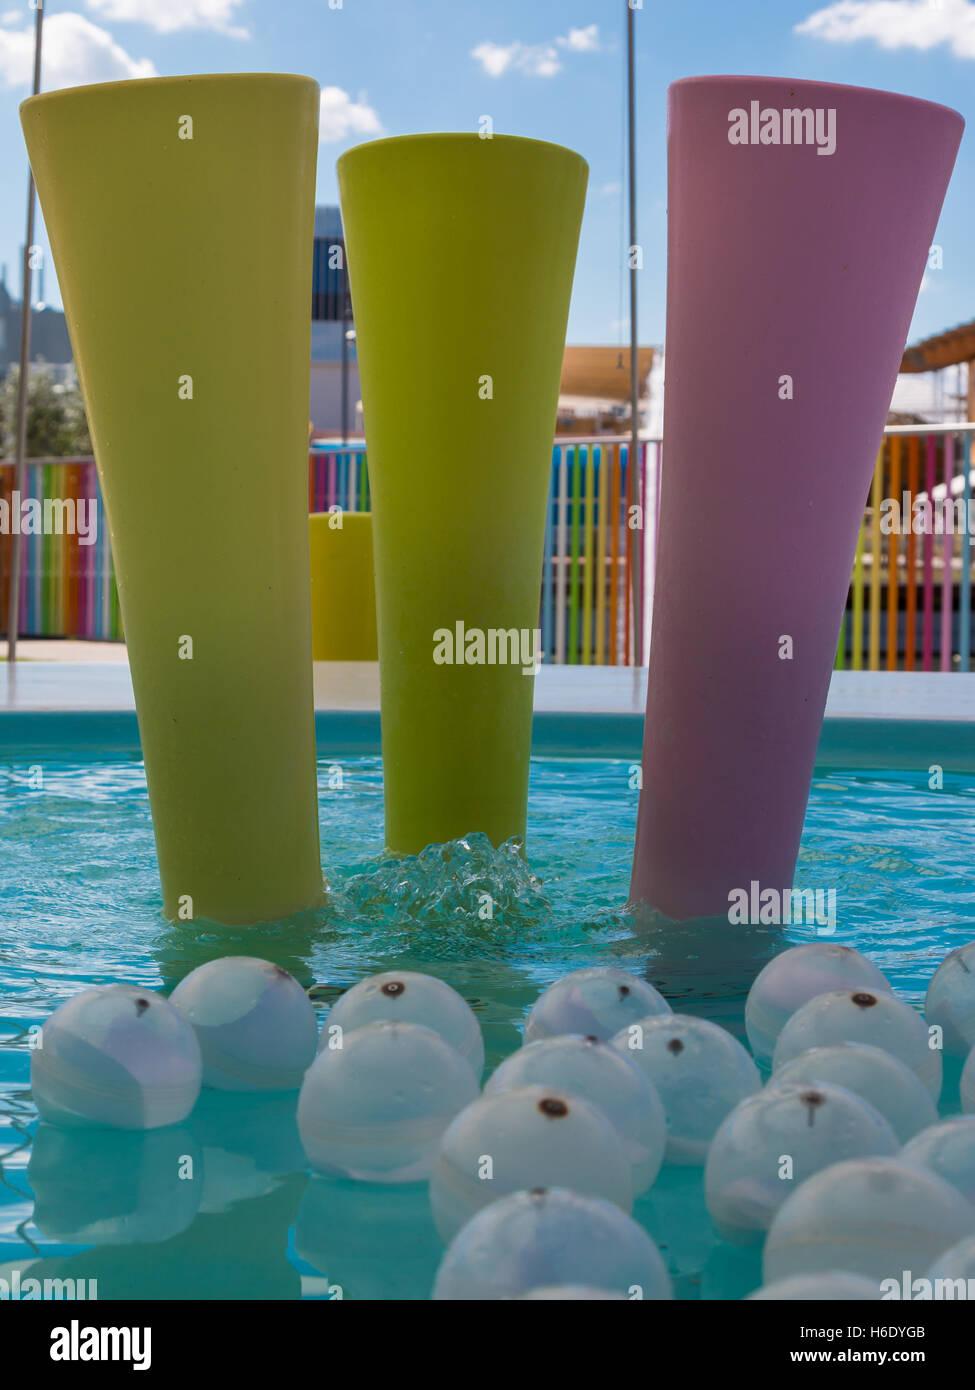 Colorful Plastic Furniture in Kids Playground: Design